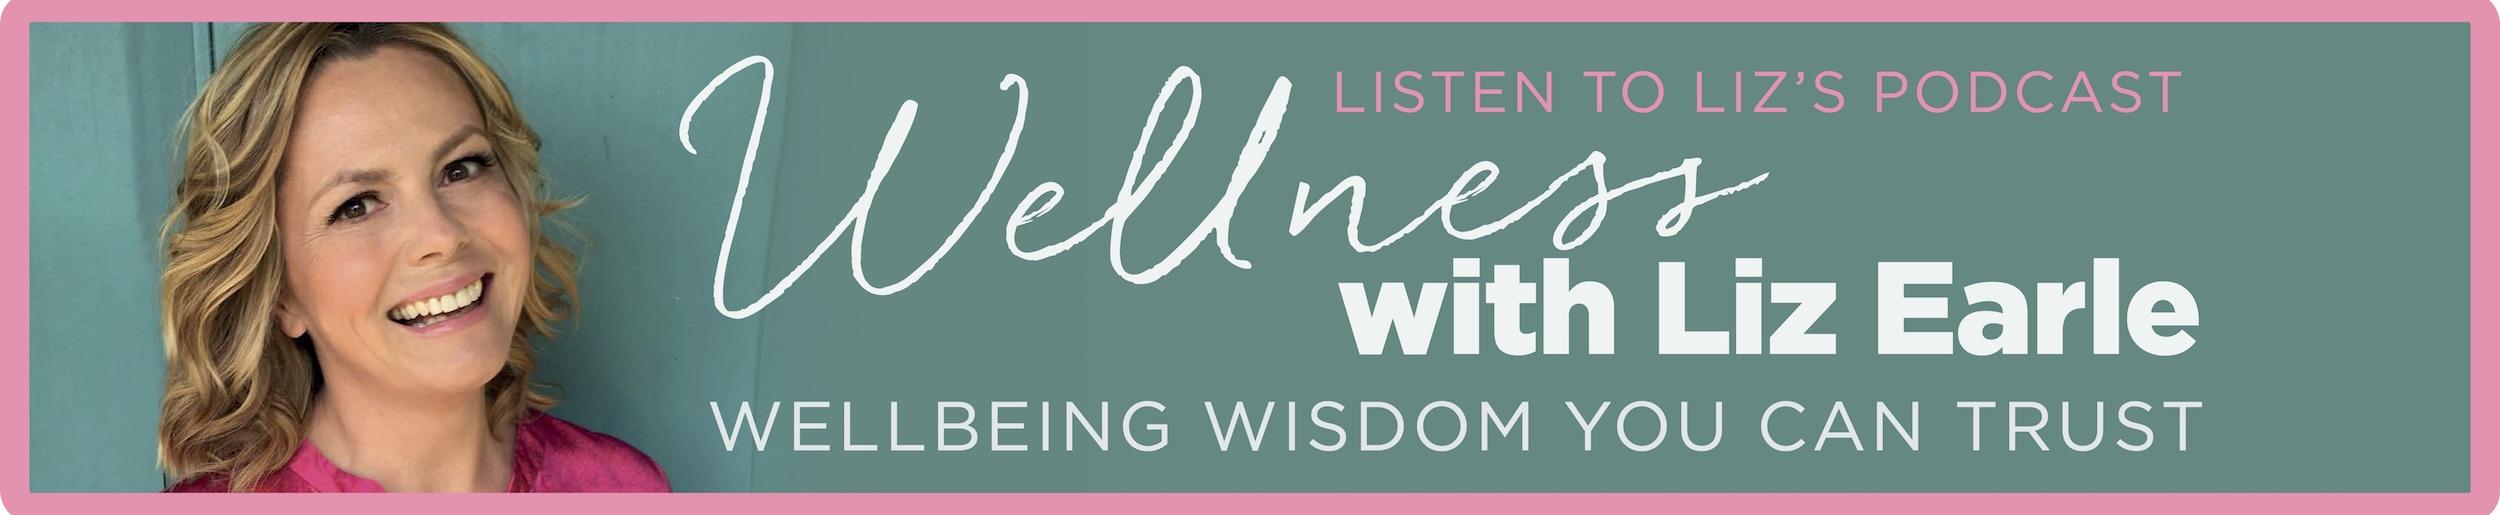 Wellness-with-Liz-Earle-new-banner.jpg